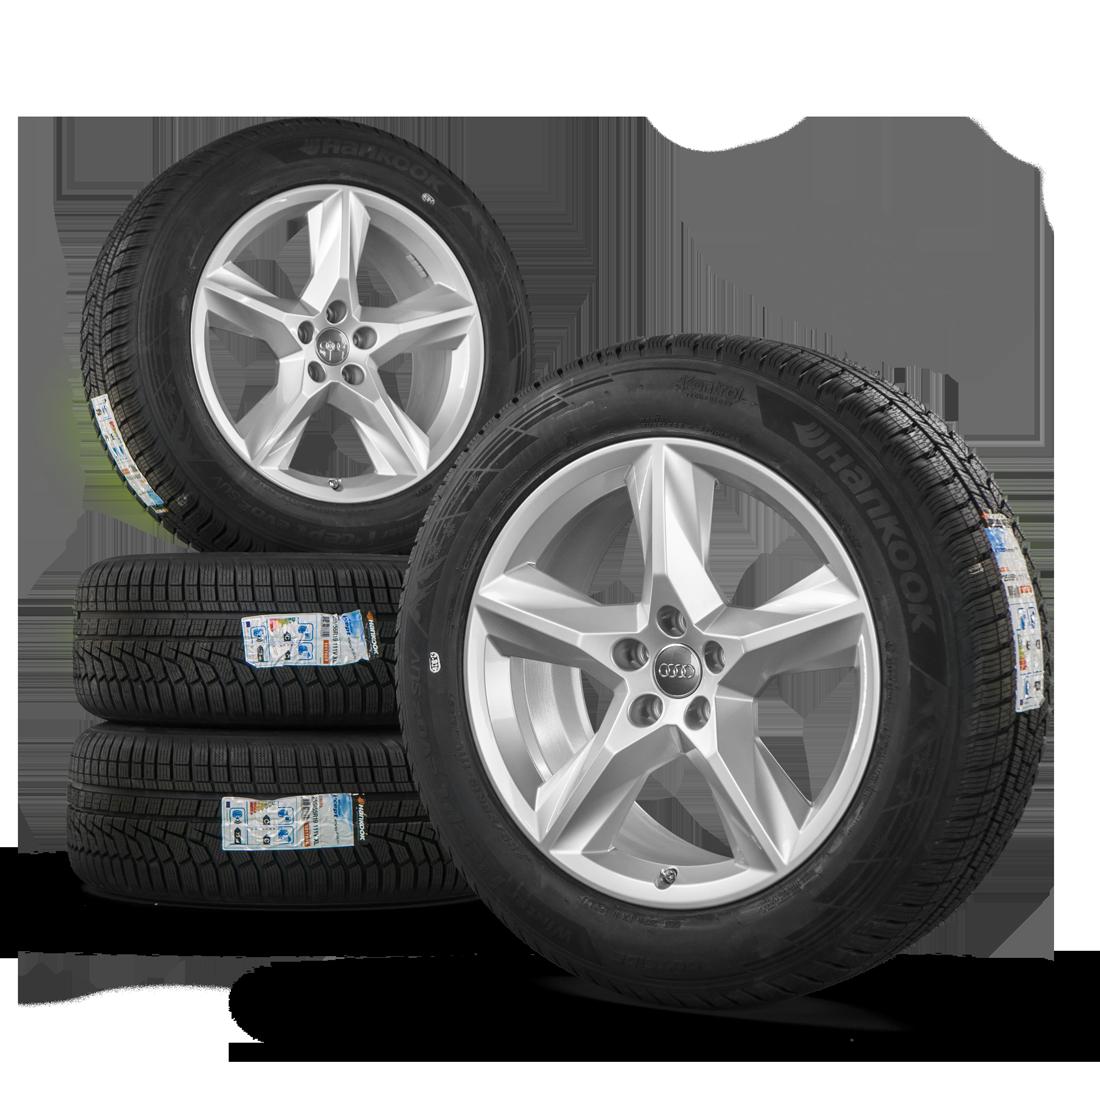 original audi sq7 4m 19 inch alloy wheels rims winter tyres. Black Bedroom Furniture Sets. Home Design Ideas